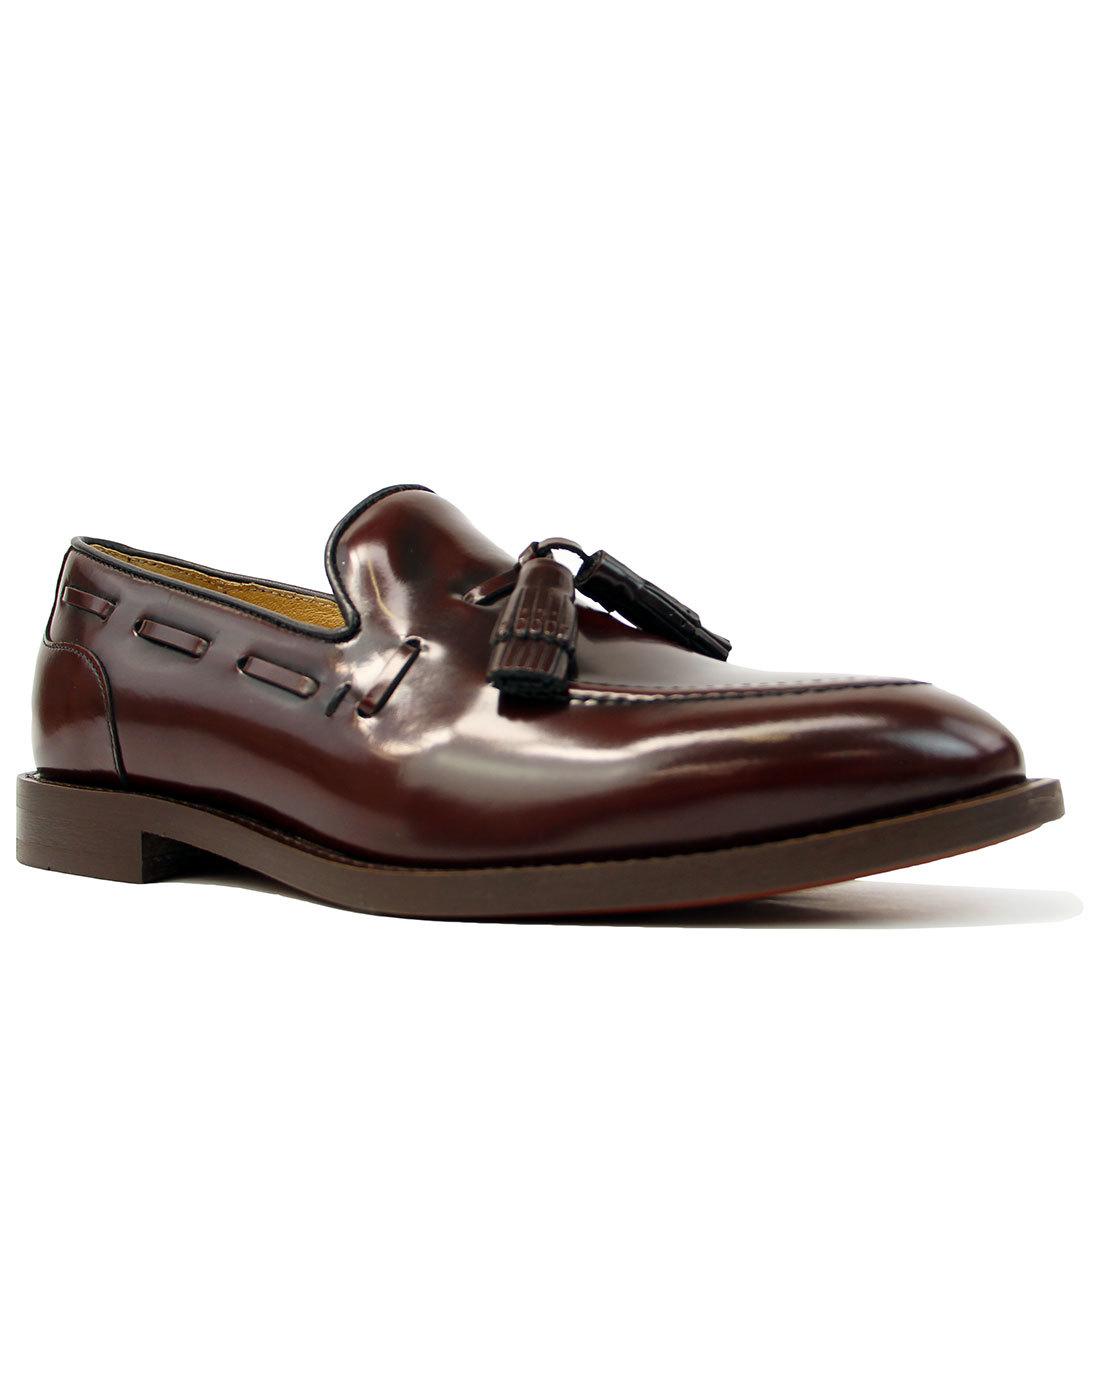 Benedict HUDSON 60s Mod Hi Shine Tassel Loafers B